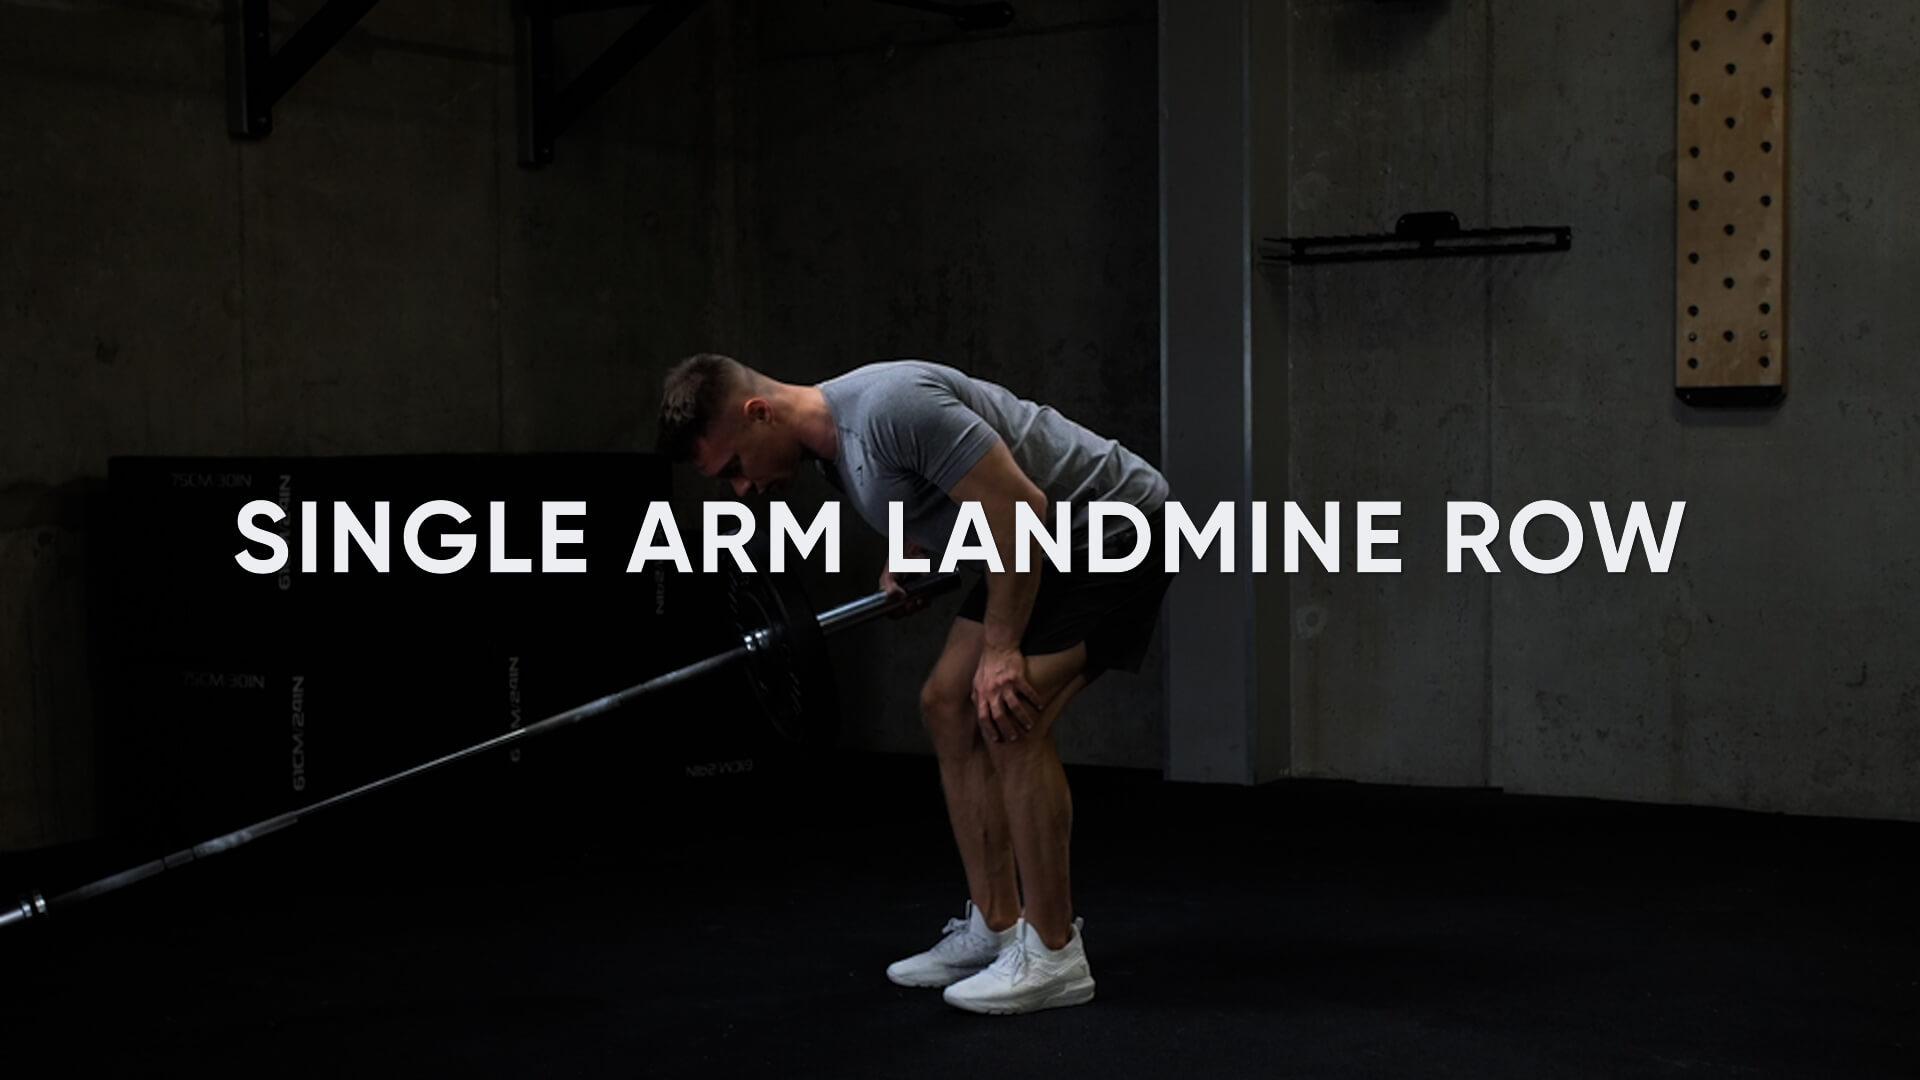 Single Arm Landmine Row